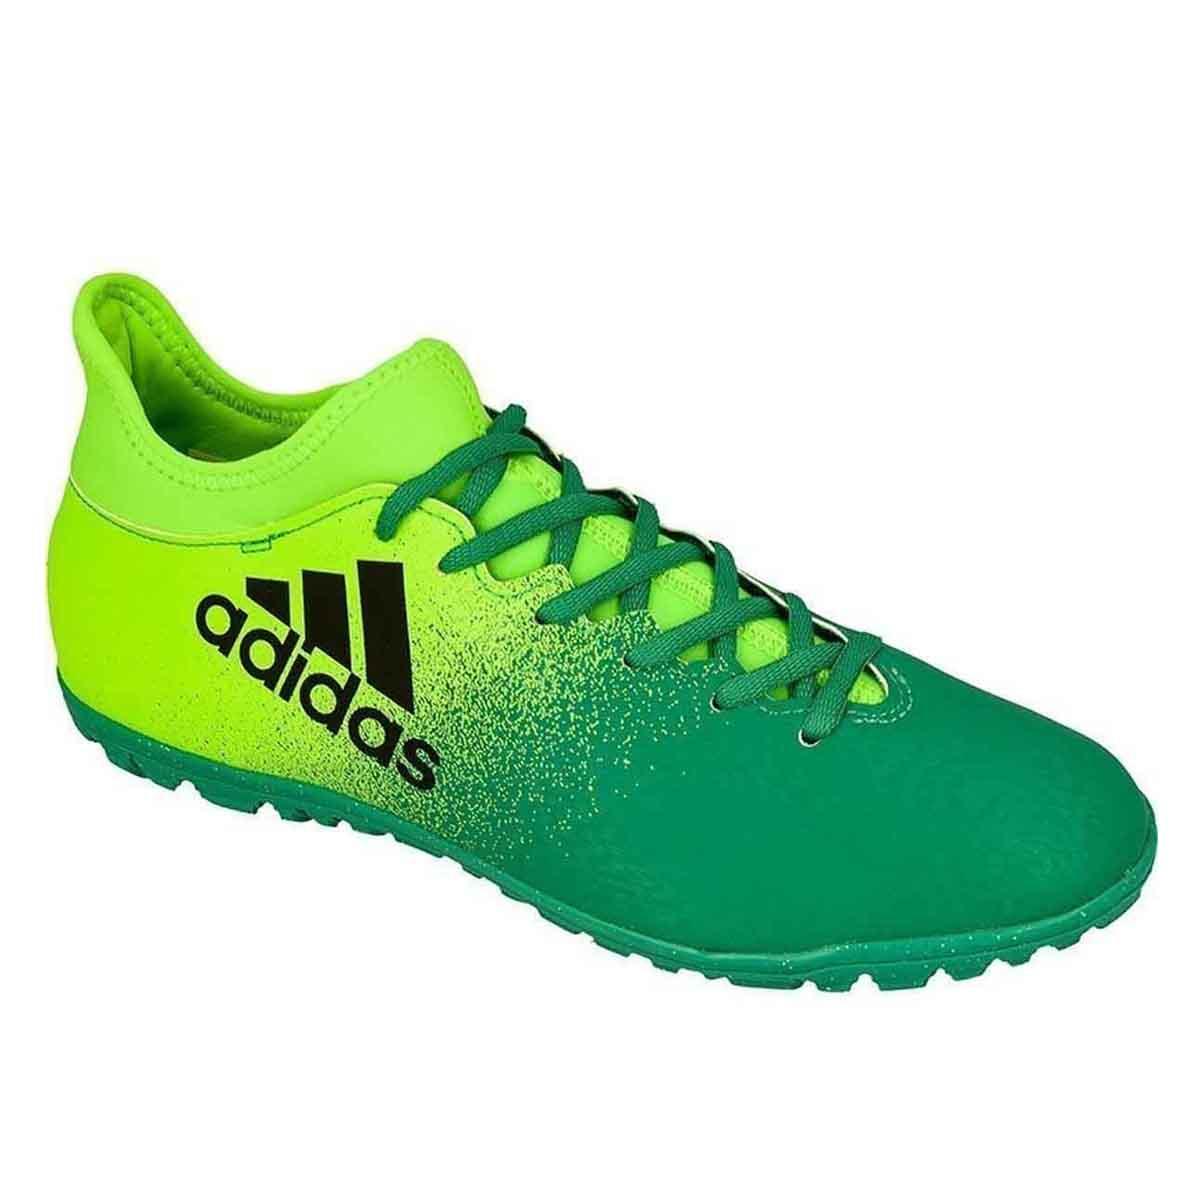 the best attitude f1e5a e95e7 Adidas X 16.3 Turf Football Shoes (Green)